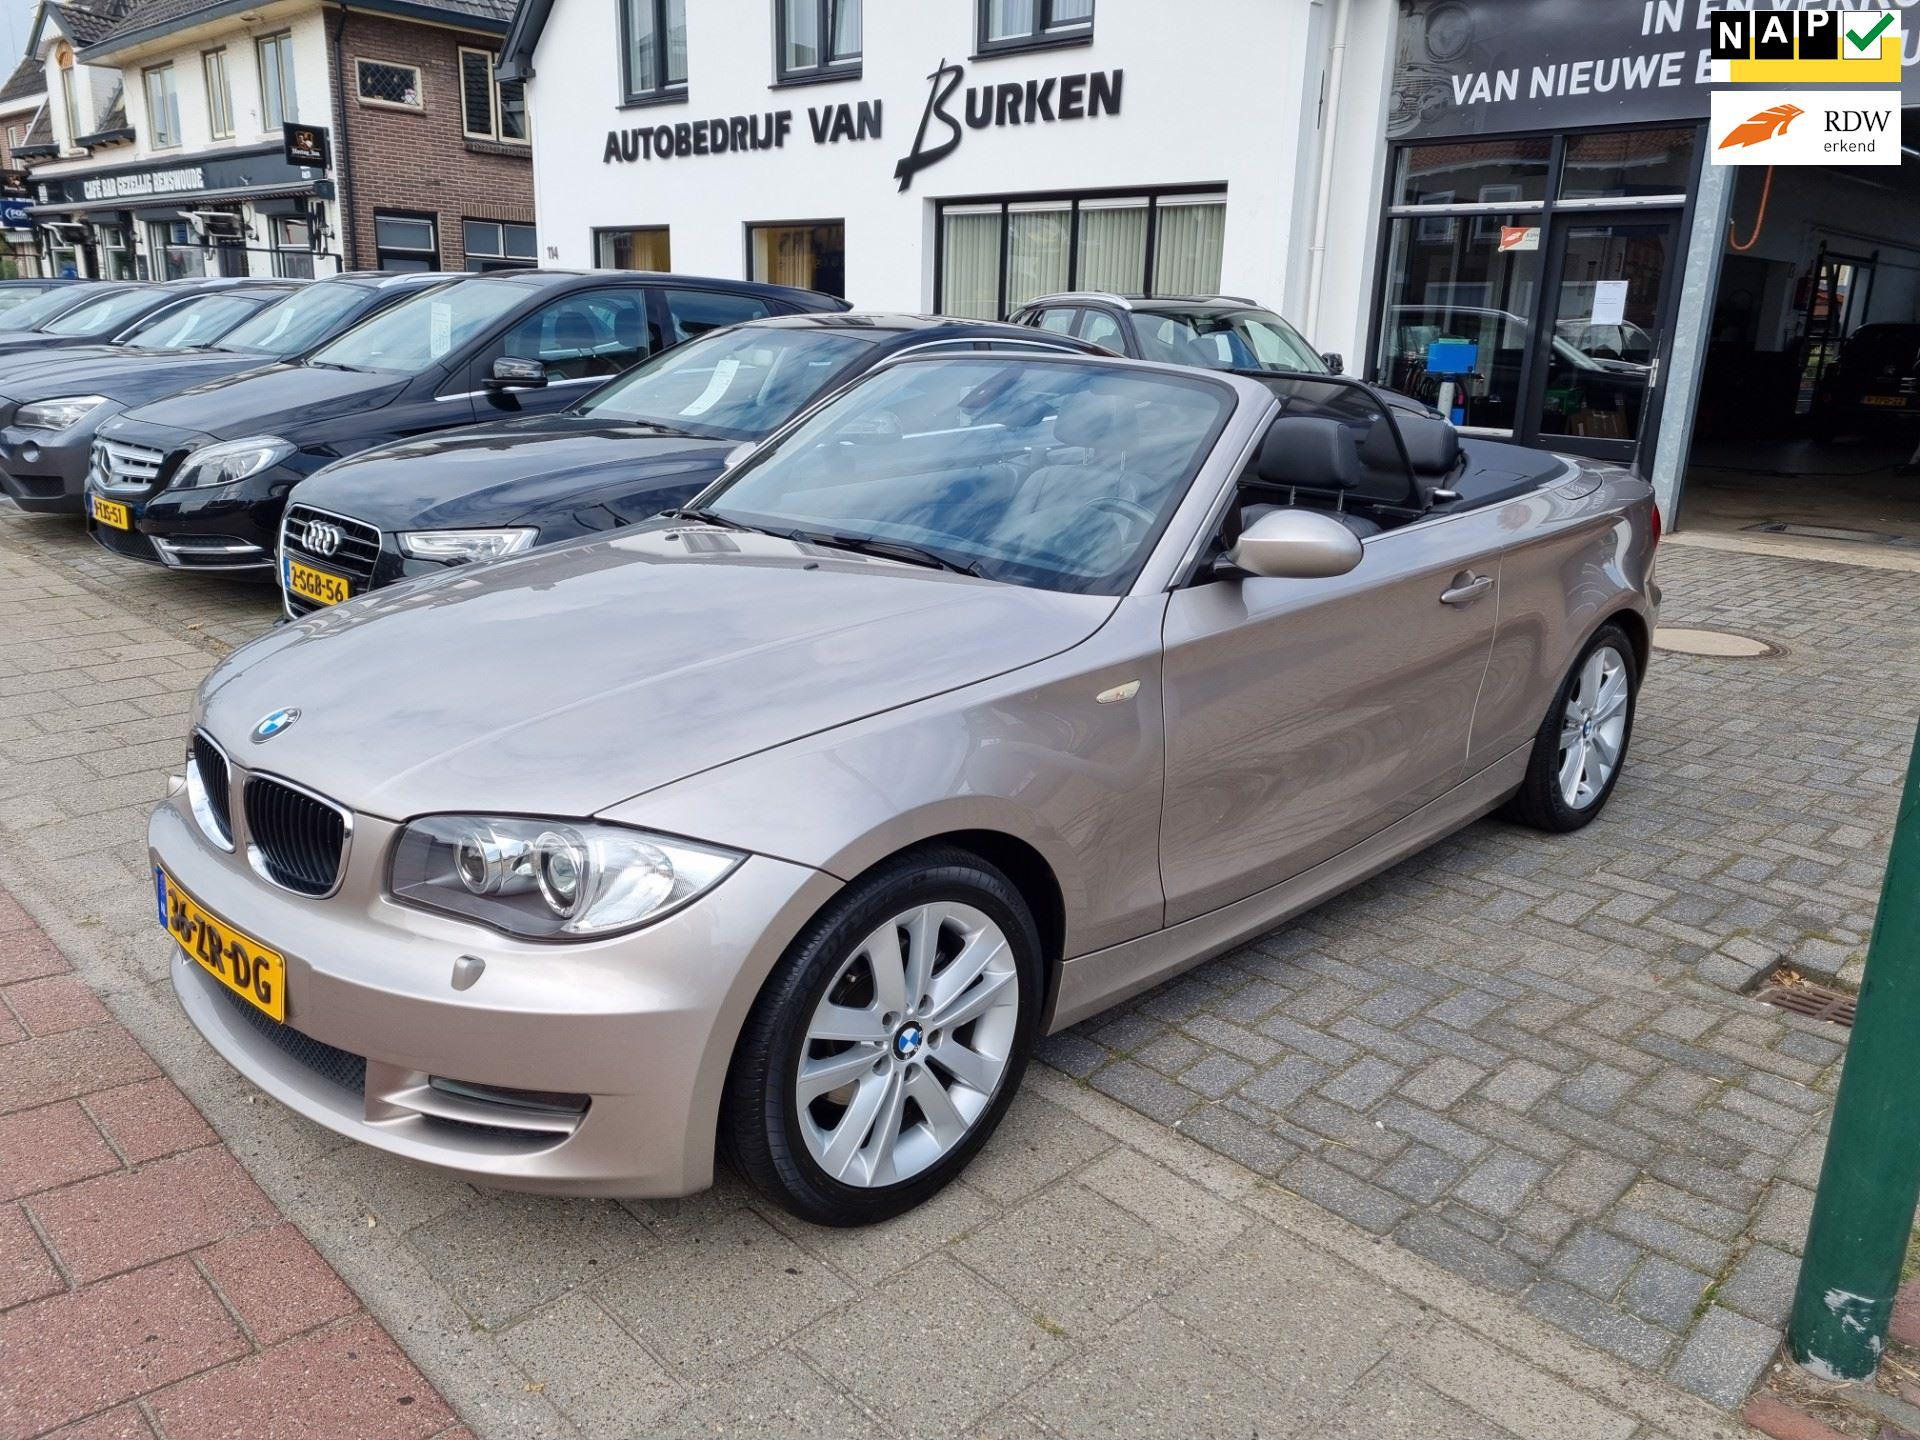 BMW 1-serie Cabrio occasion - Autobedrijf van Burken